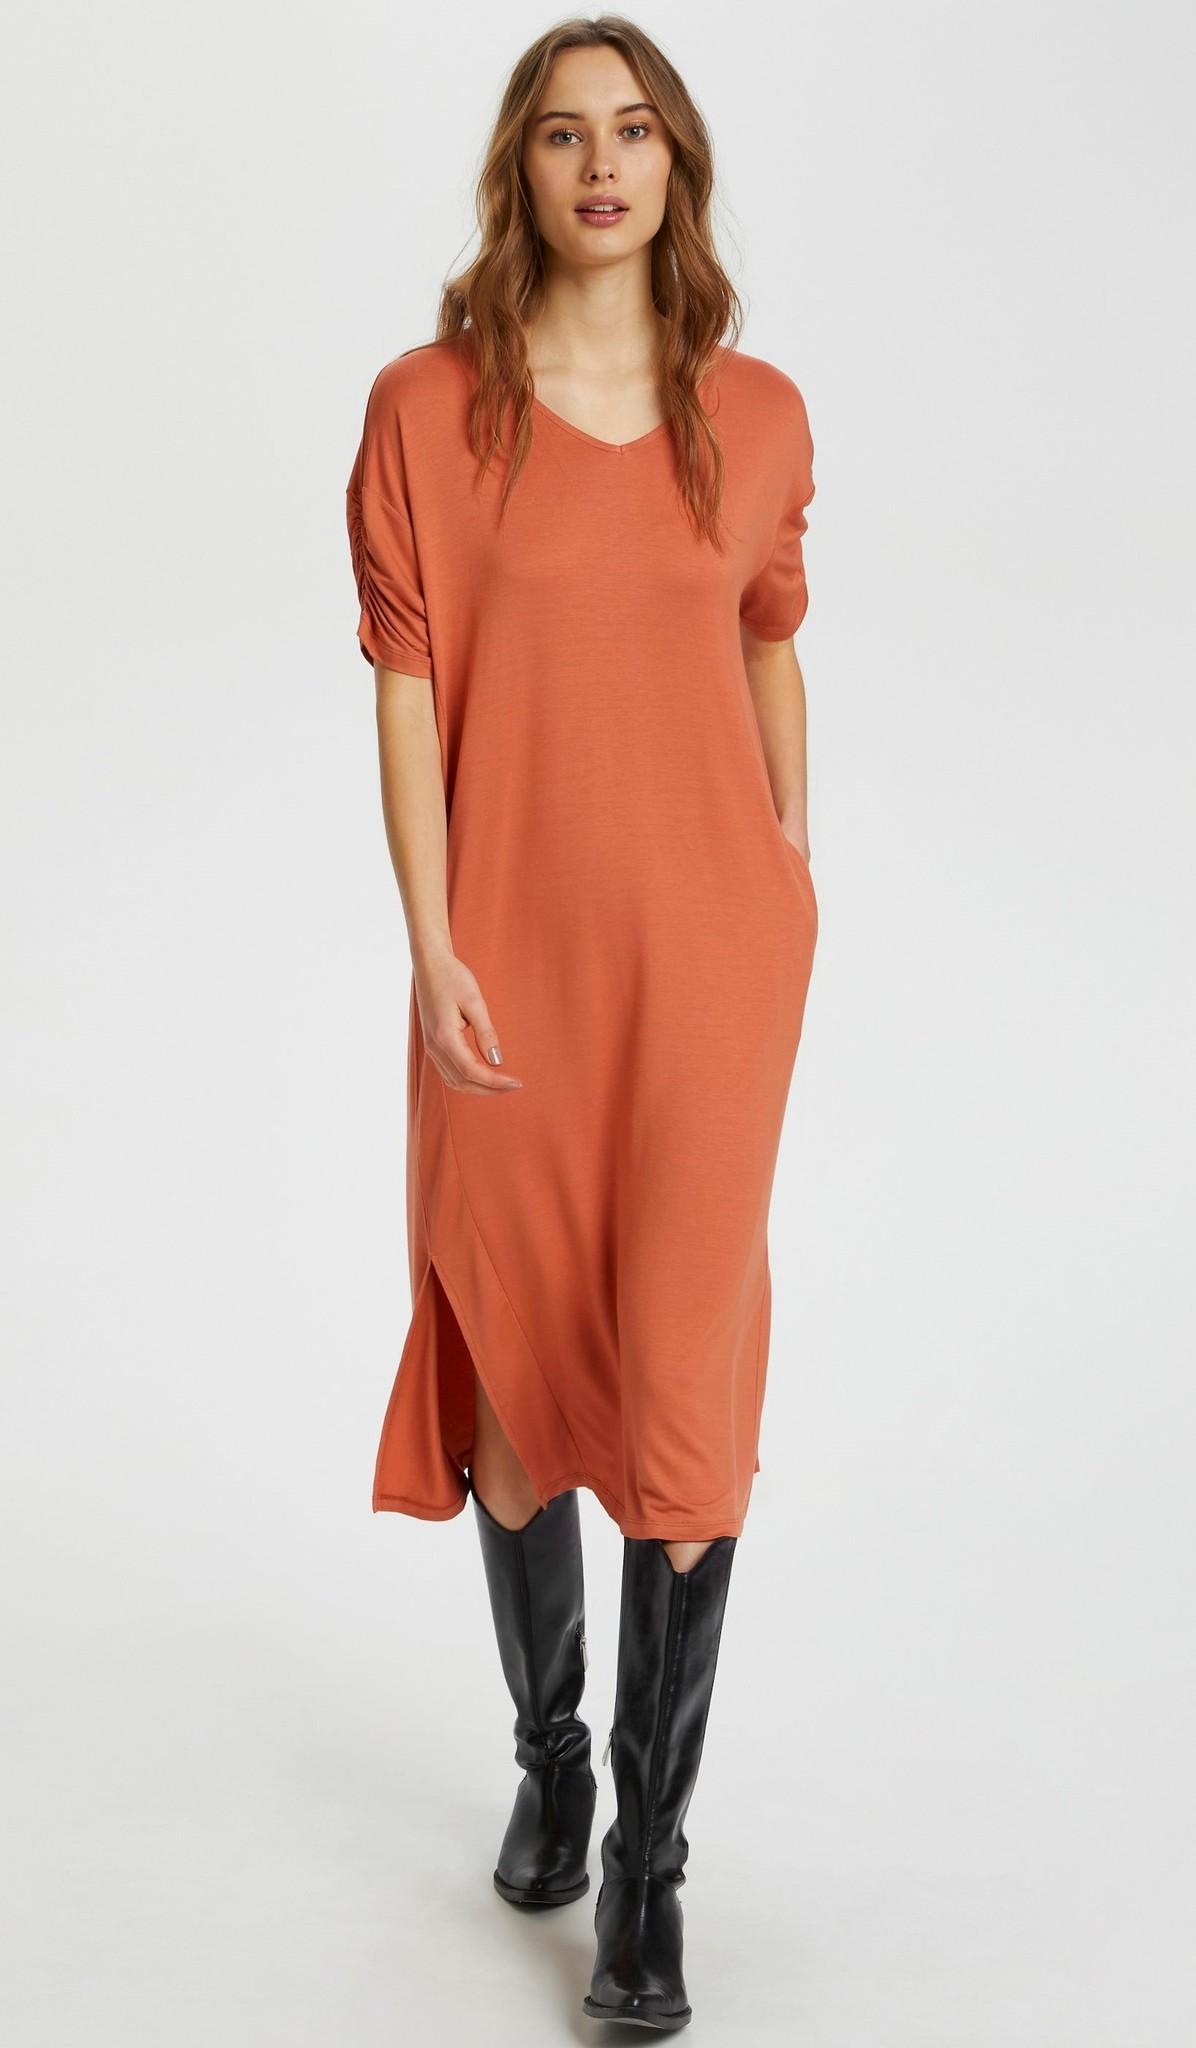 Jurk LivaCR long dress aragon-8